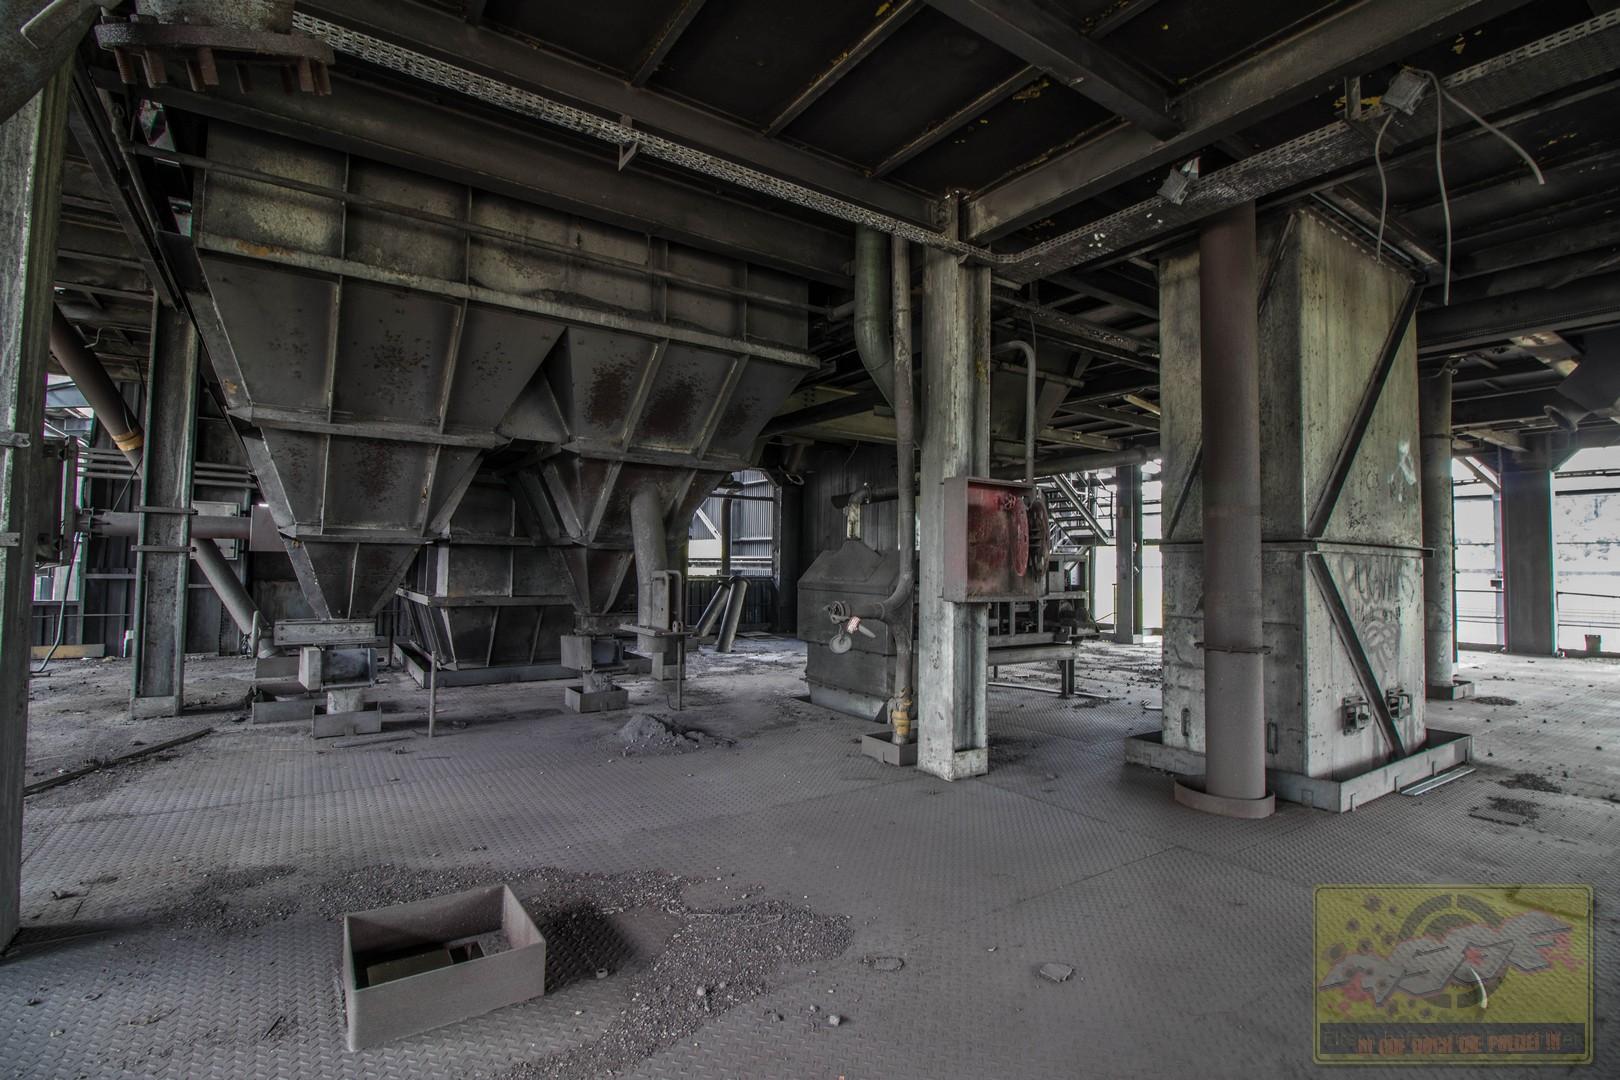 Bauxitfabrik-27.06.2020-22